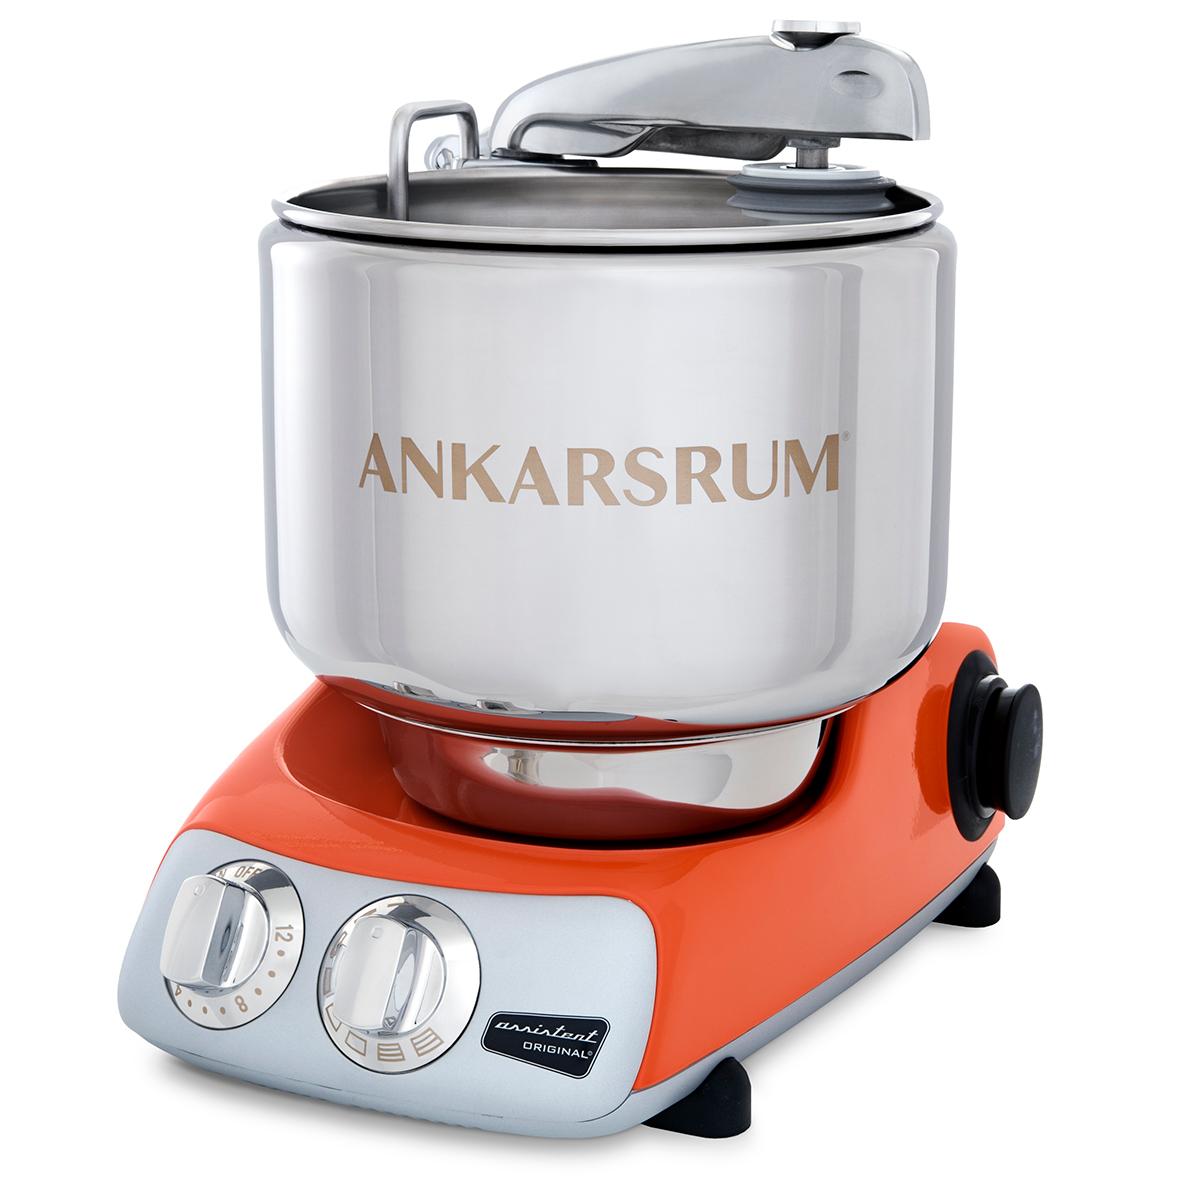 Image of   Ankarsrum køkkenmaskine Assistent Original AKM 6230 PO - Orange